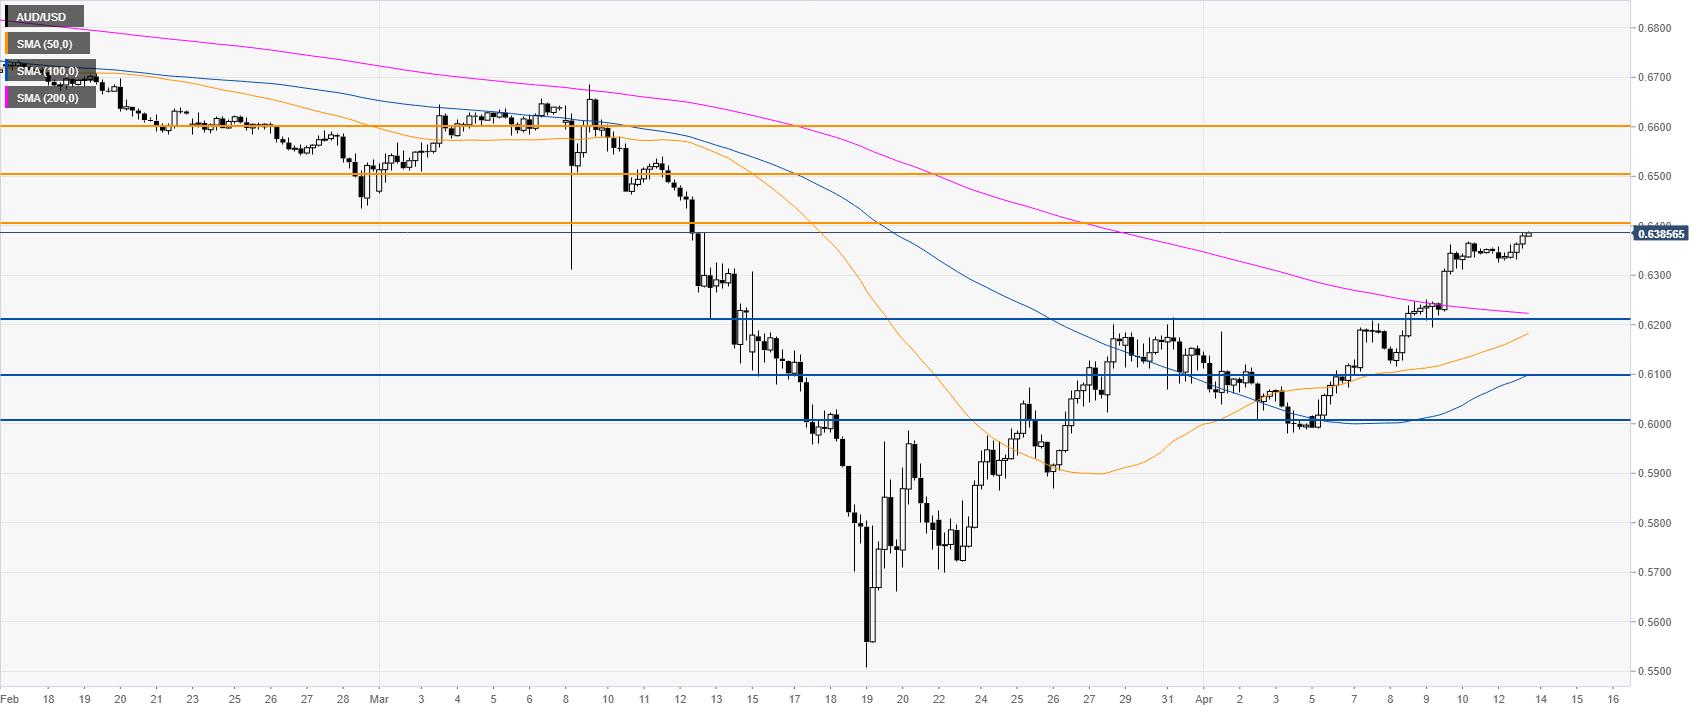 AUD/USD Price Analysis: Aussie trades in one-month highs vs. US dollar